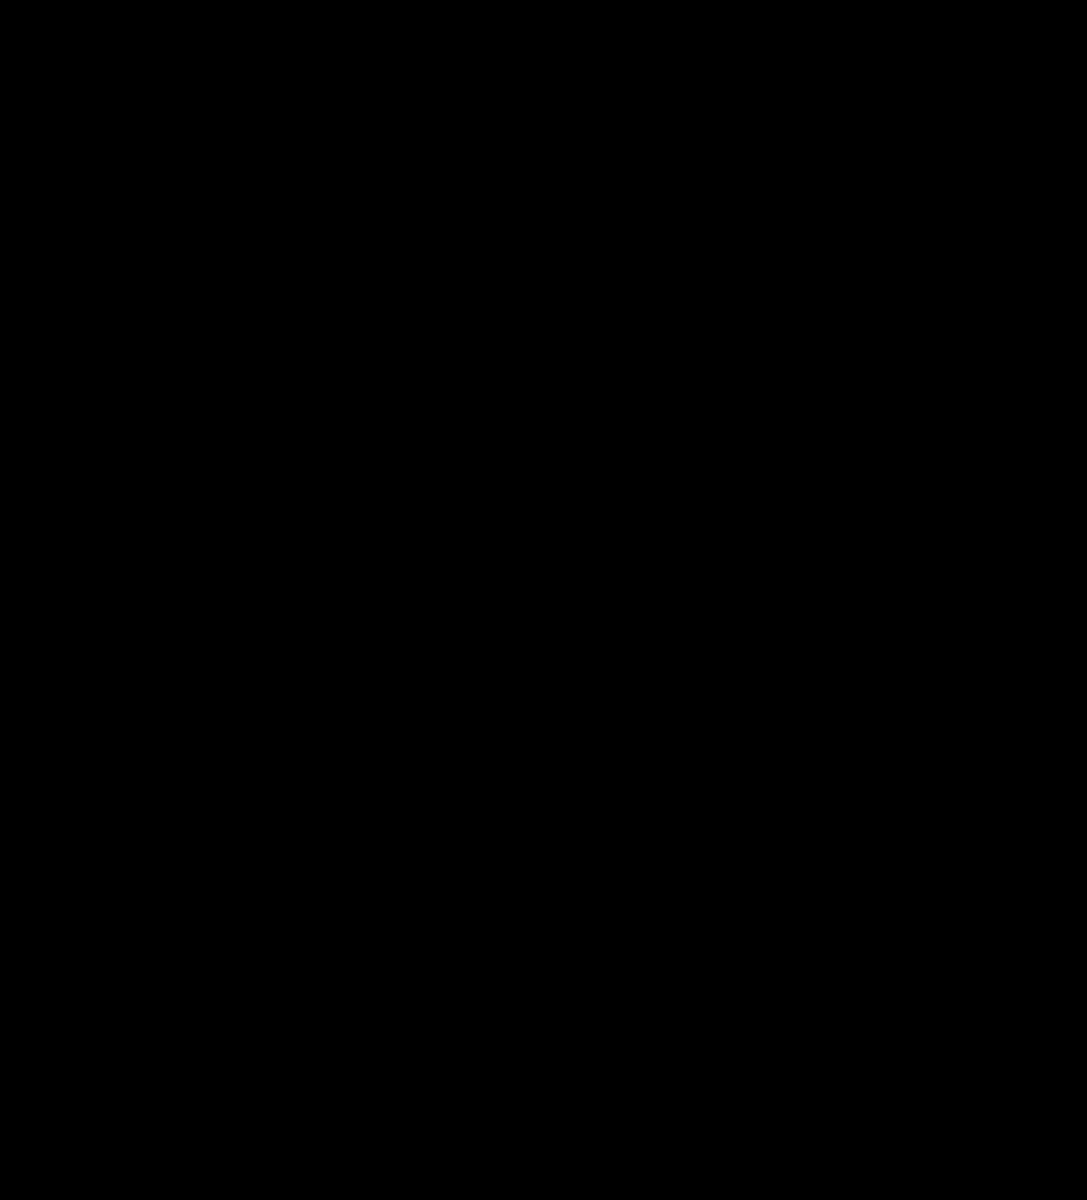 f:id:saho-tamura:20200514163540p:plain